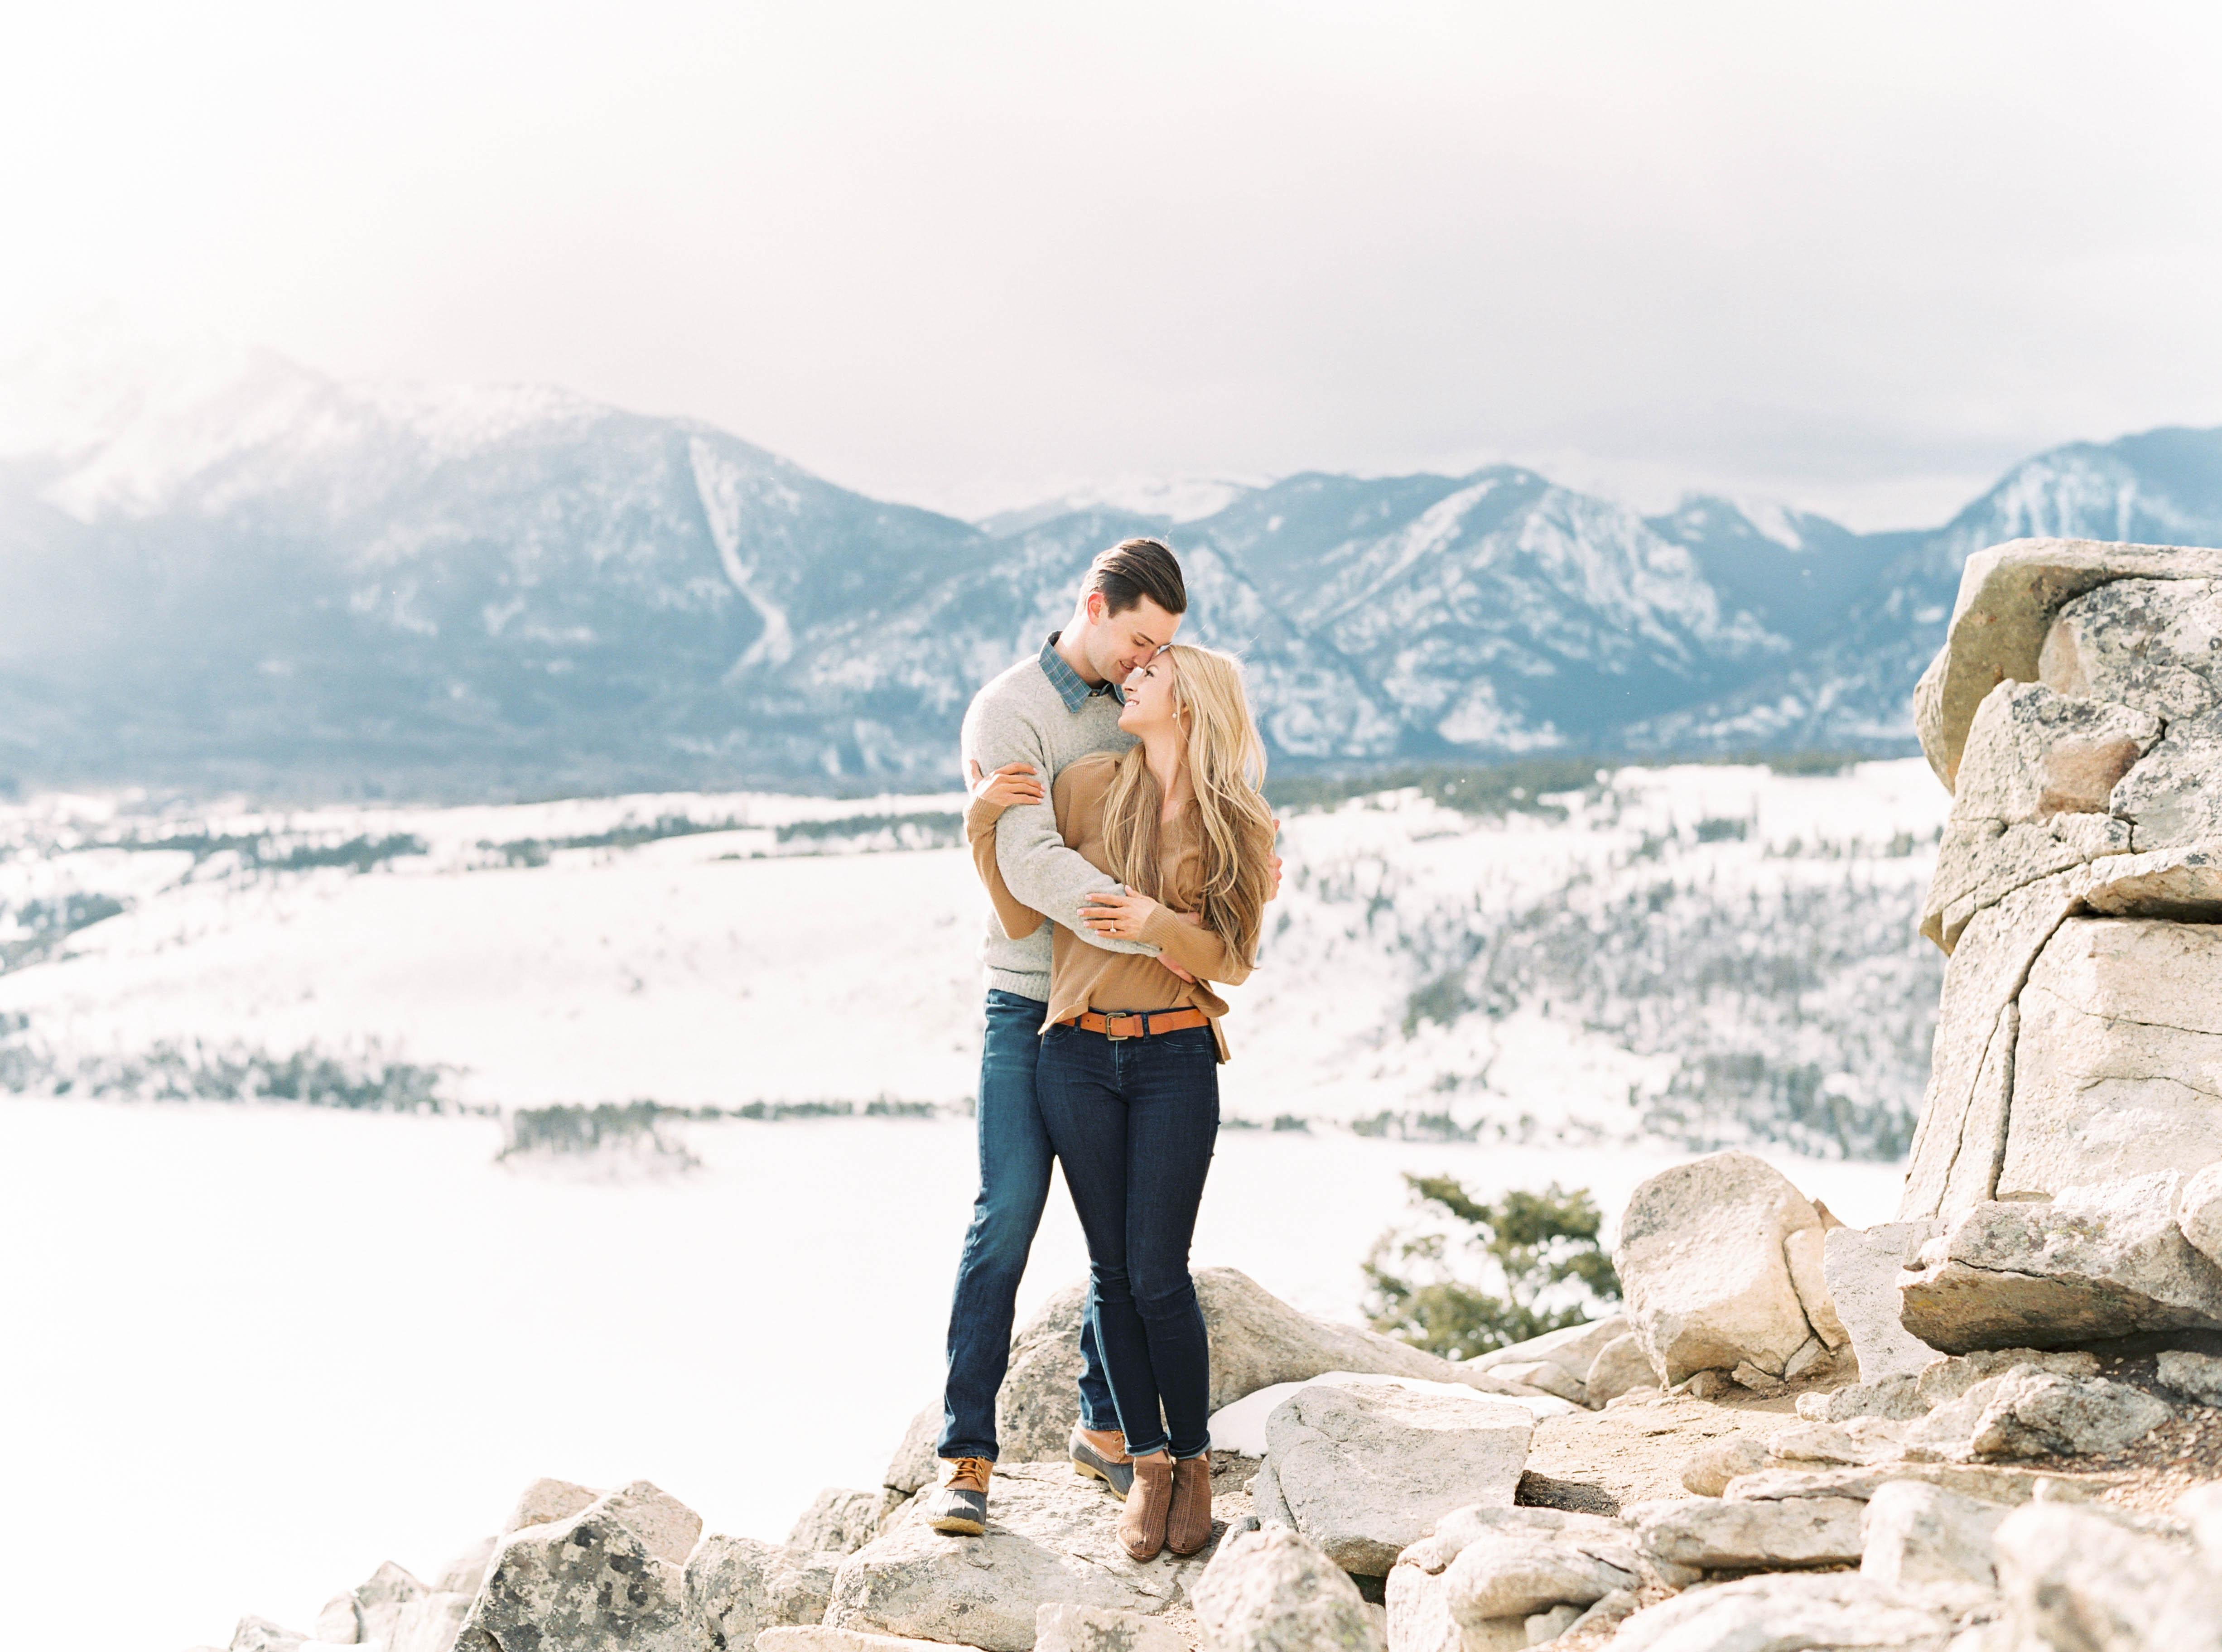 destination engagement couple snow capped mountain background